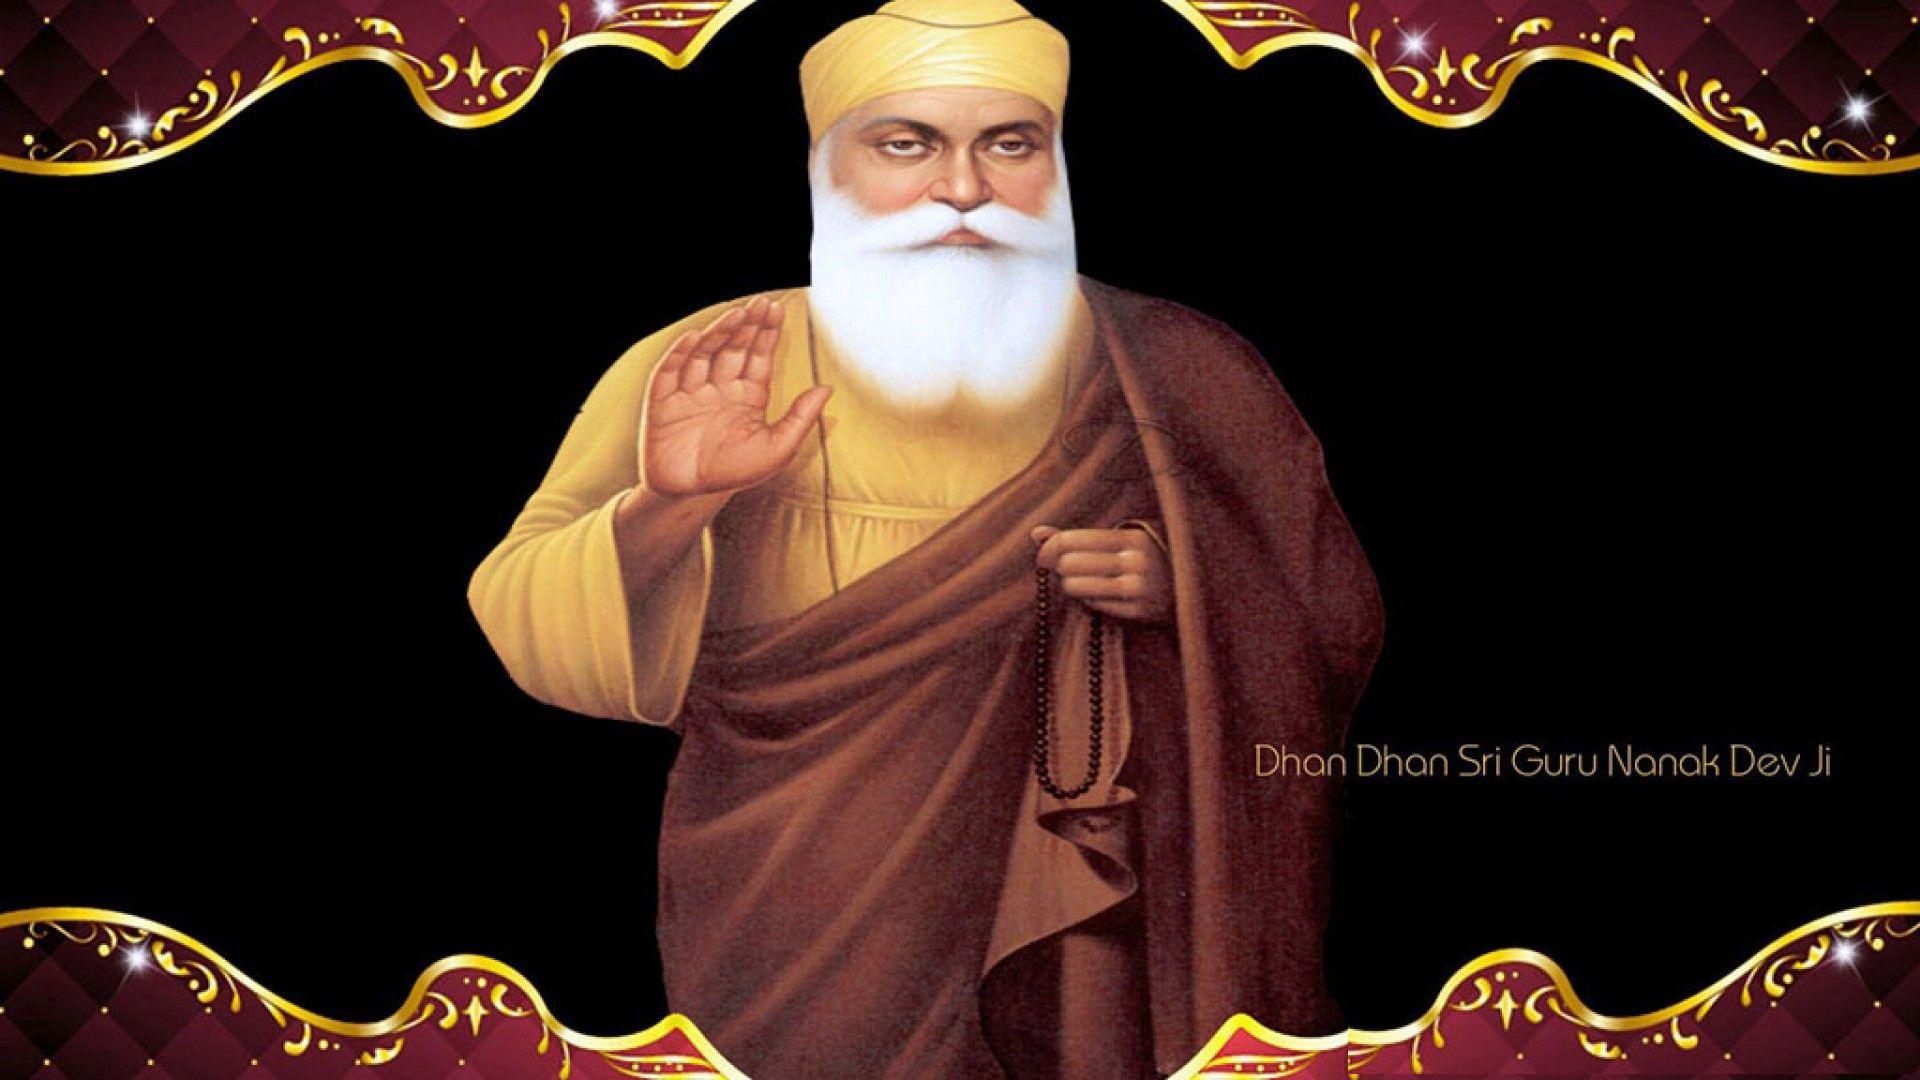 Guru Nanak Black And White Images